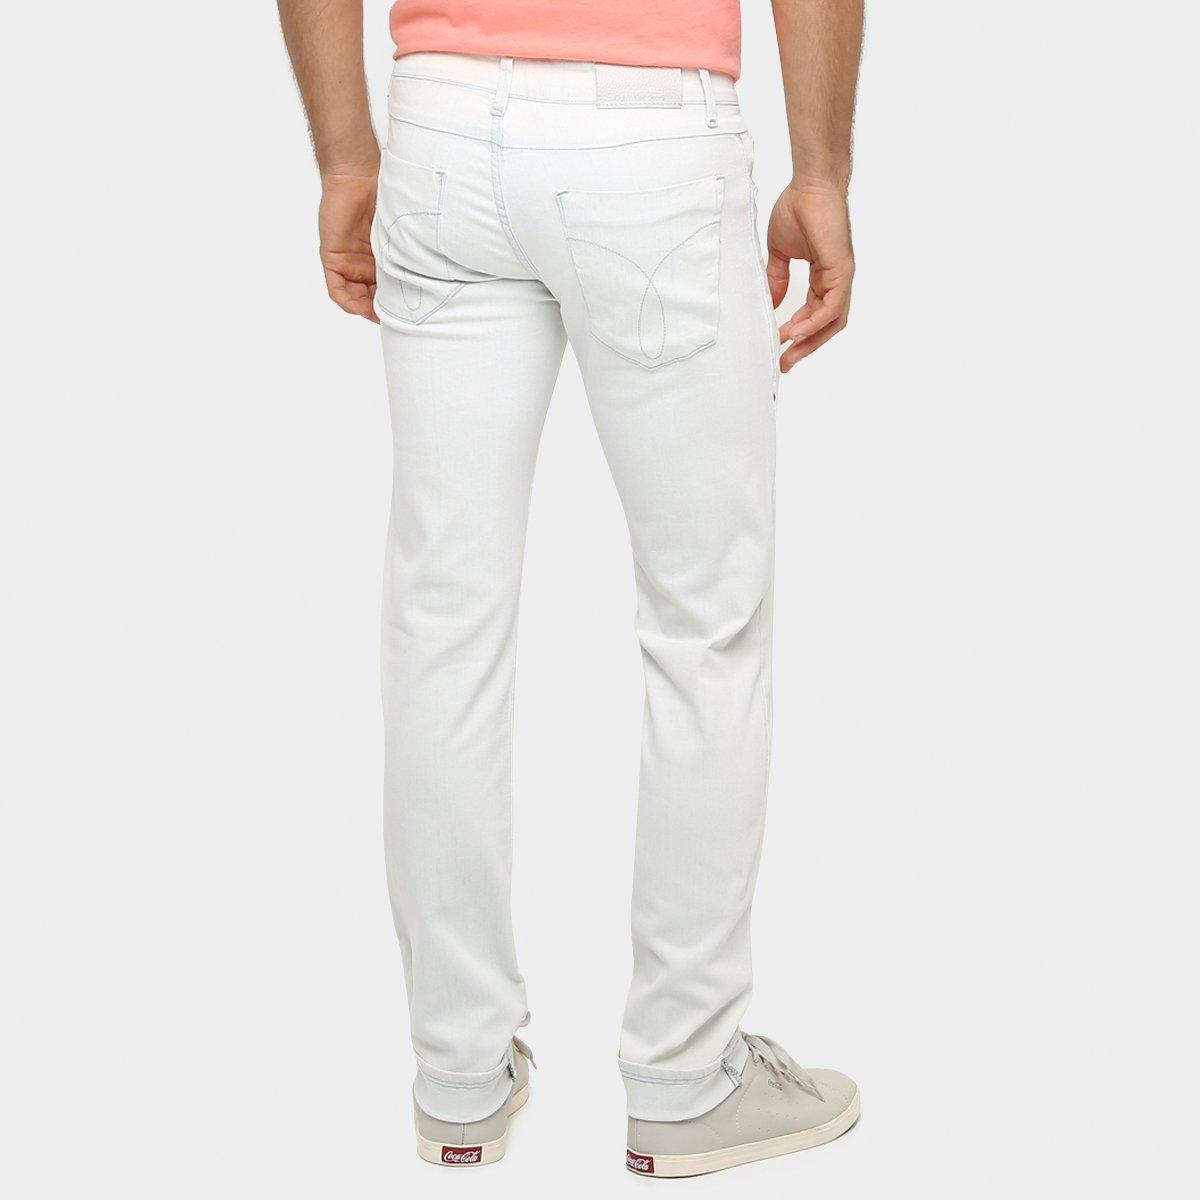 Calça Jeans Calvin Klein Skinny Five Pockets - Compre Agora  5577344b943